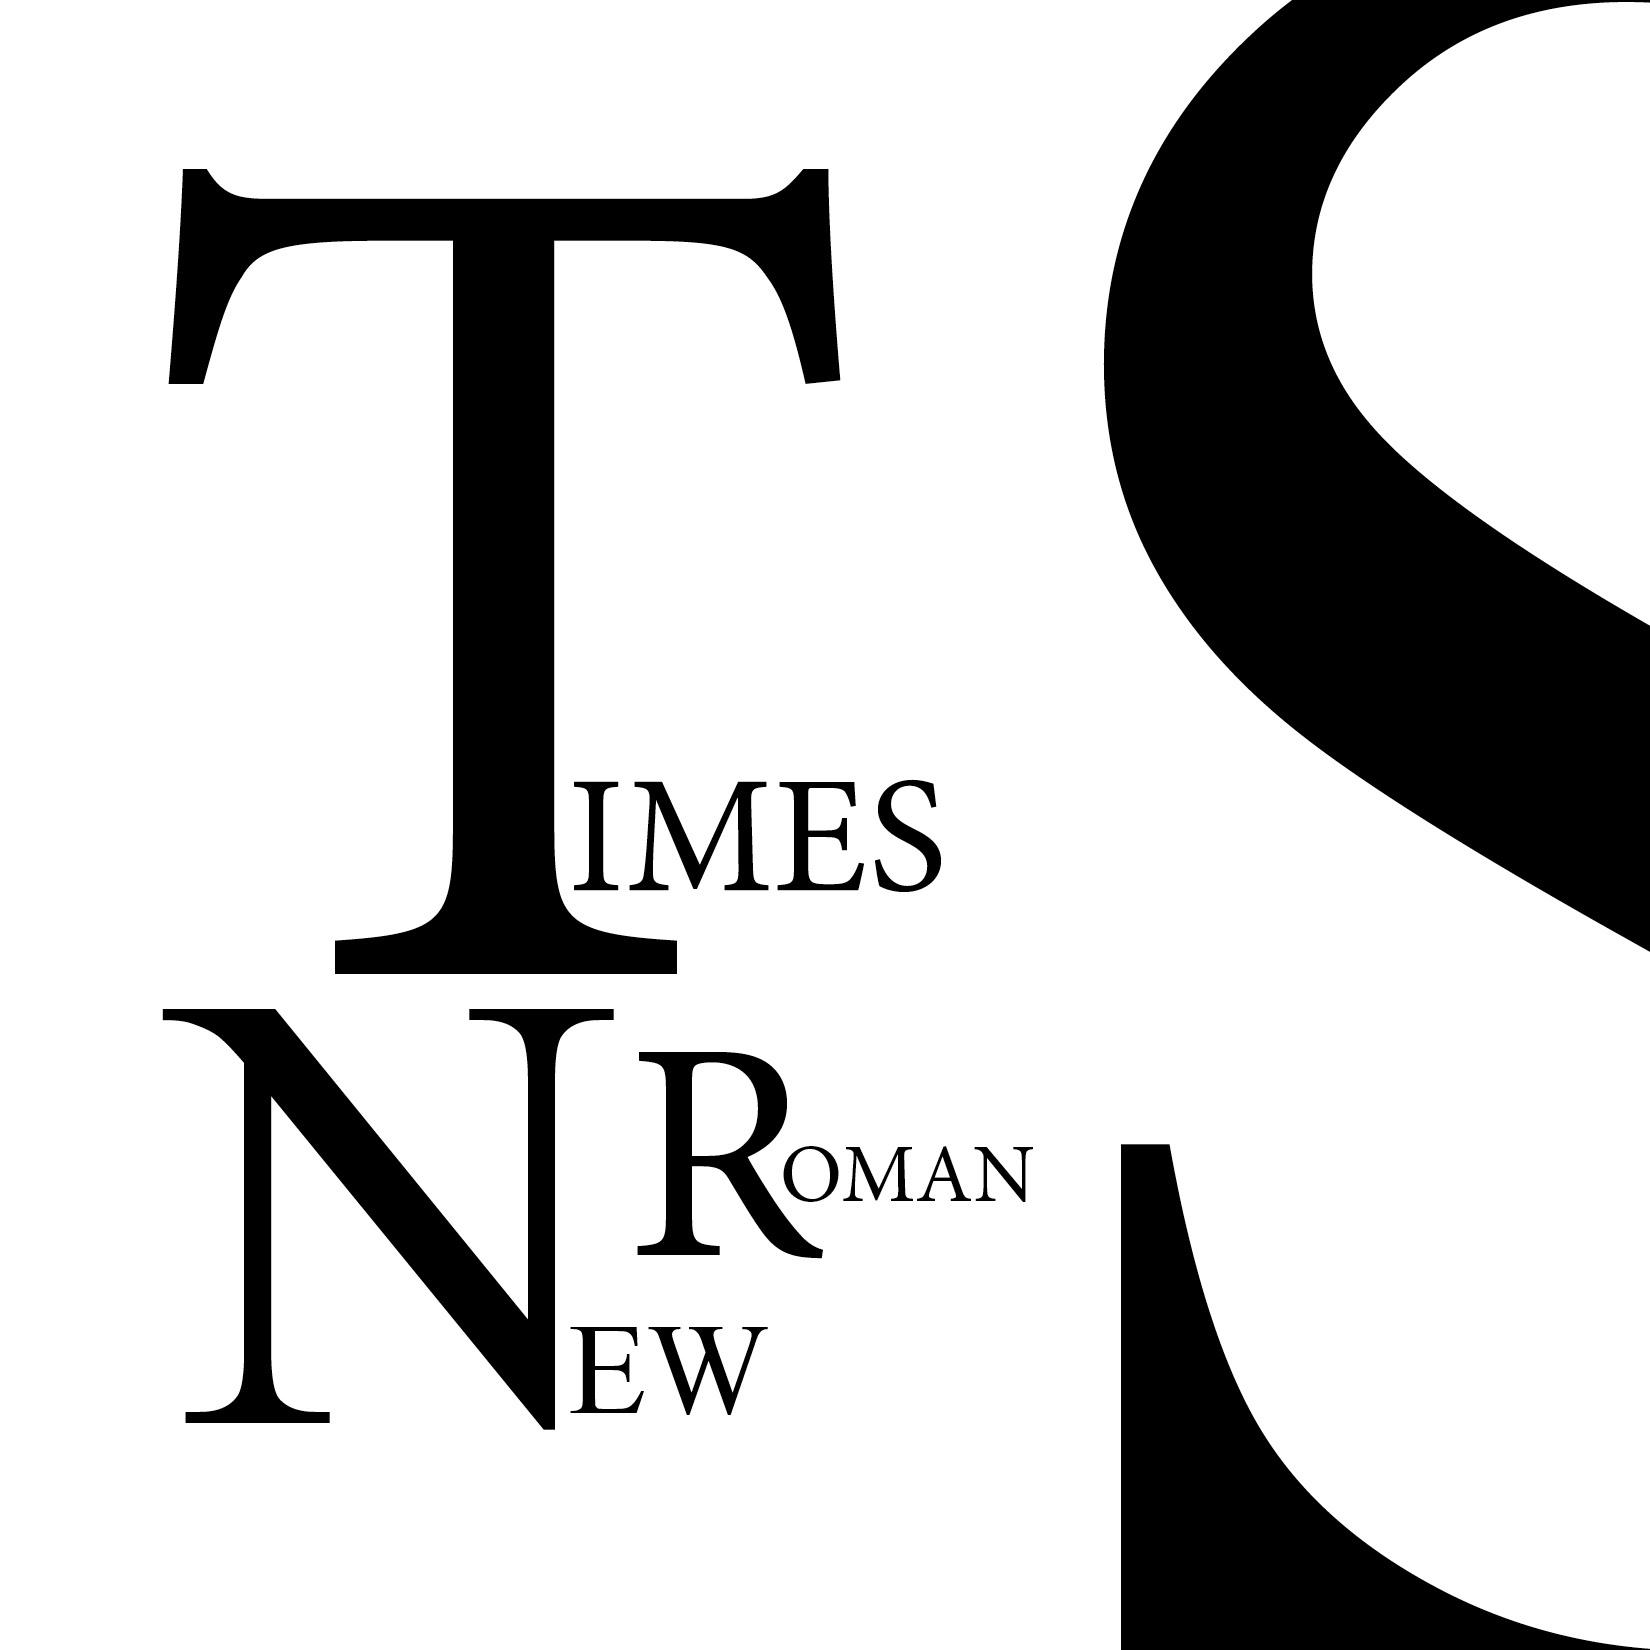 Roylance - Type Book